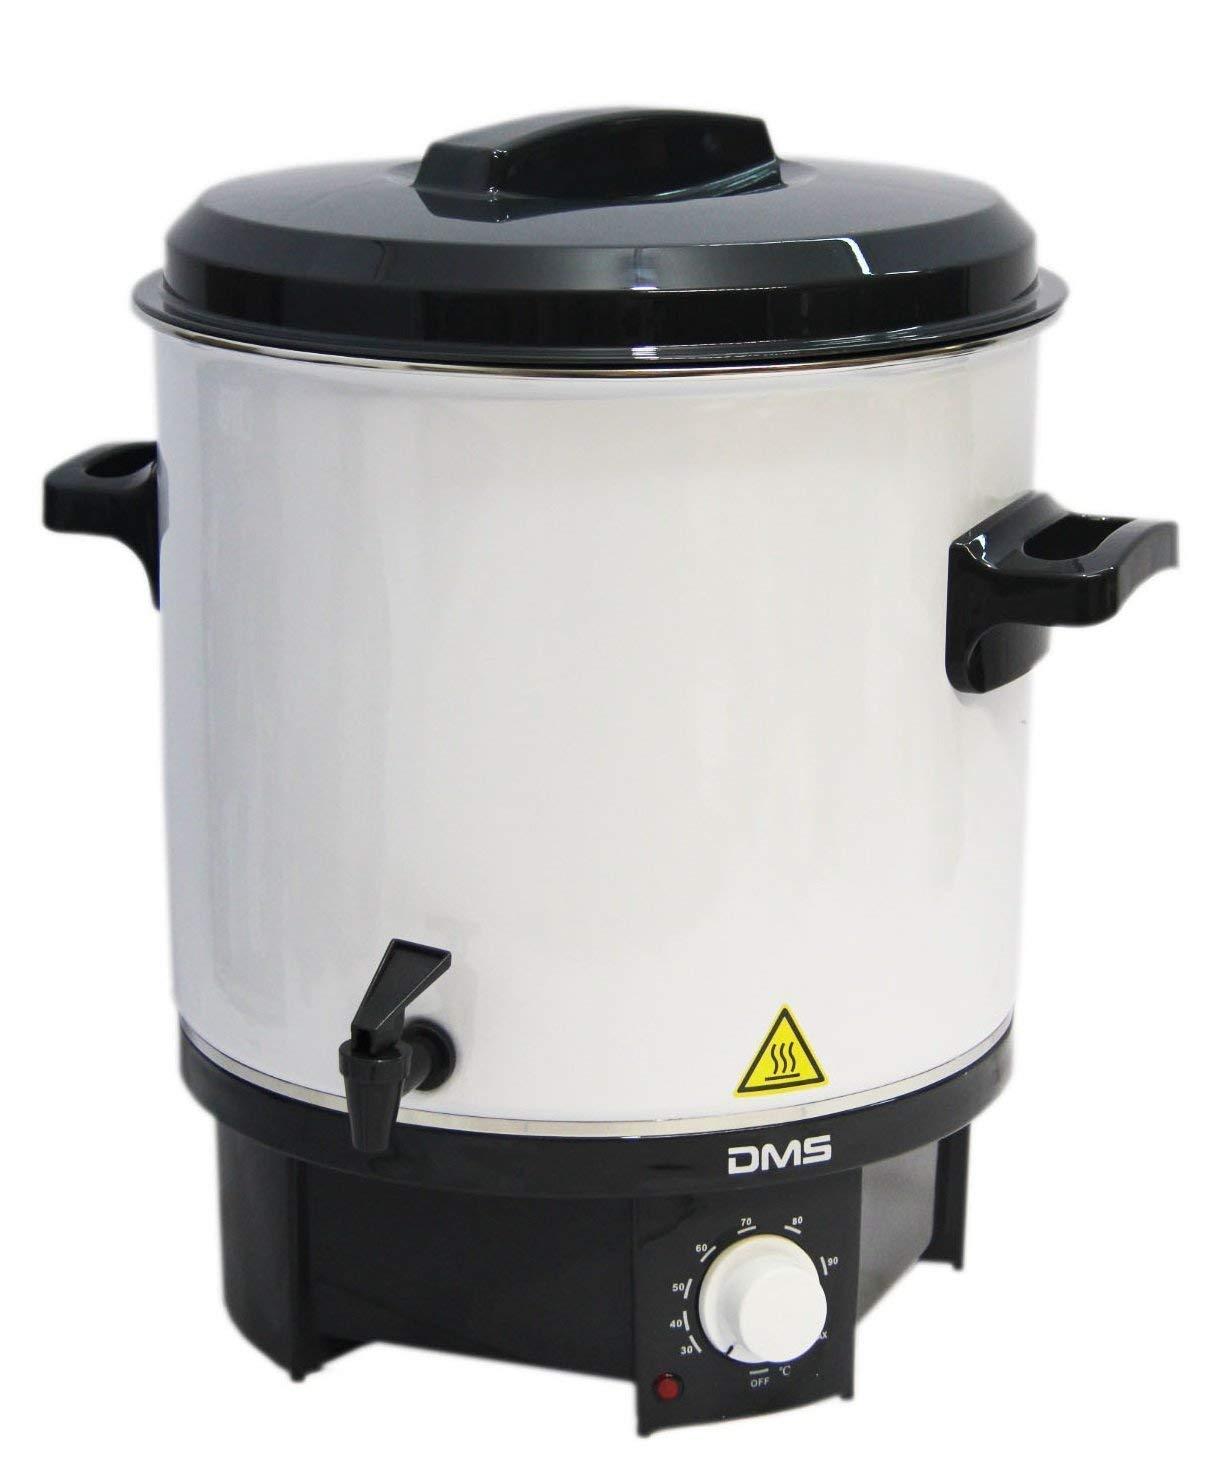 Cuocitore per conserve, per vin brulé, per bevande calde, 27L DMS® per vin brulé 27L DMS®